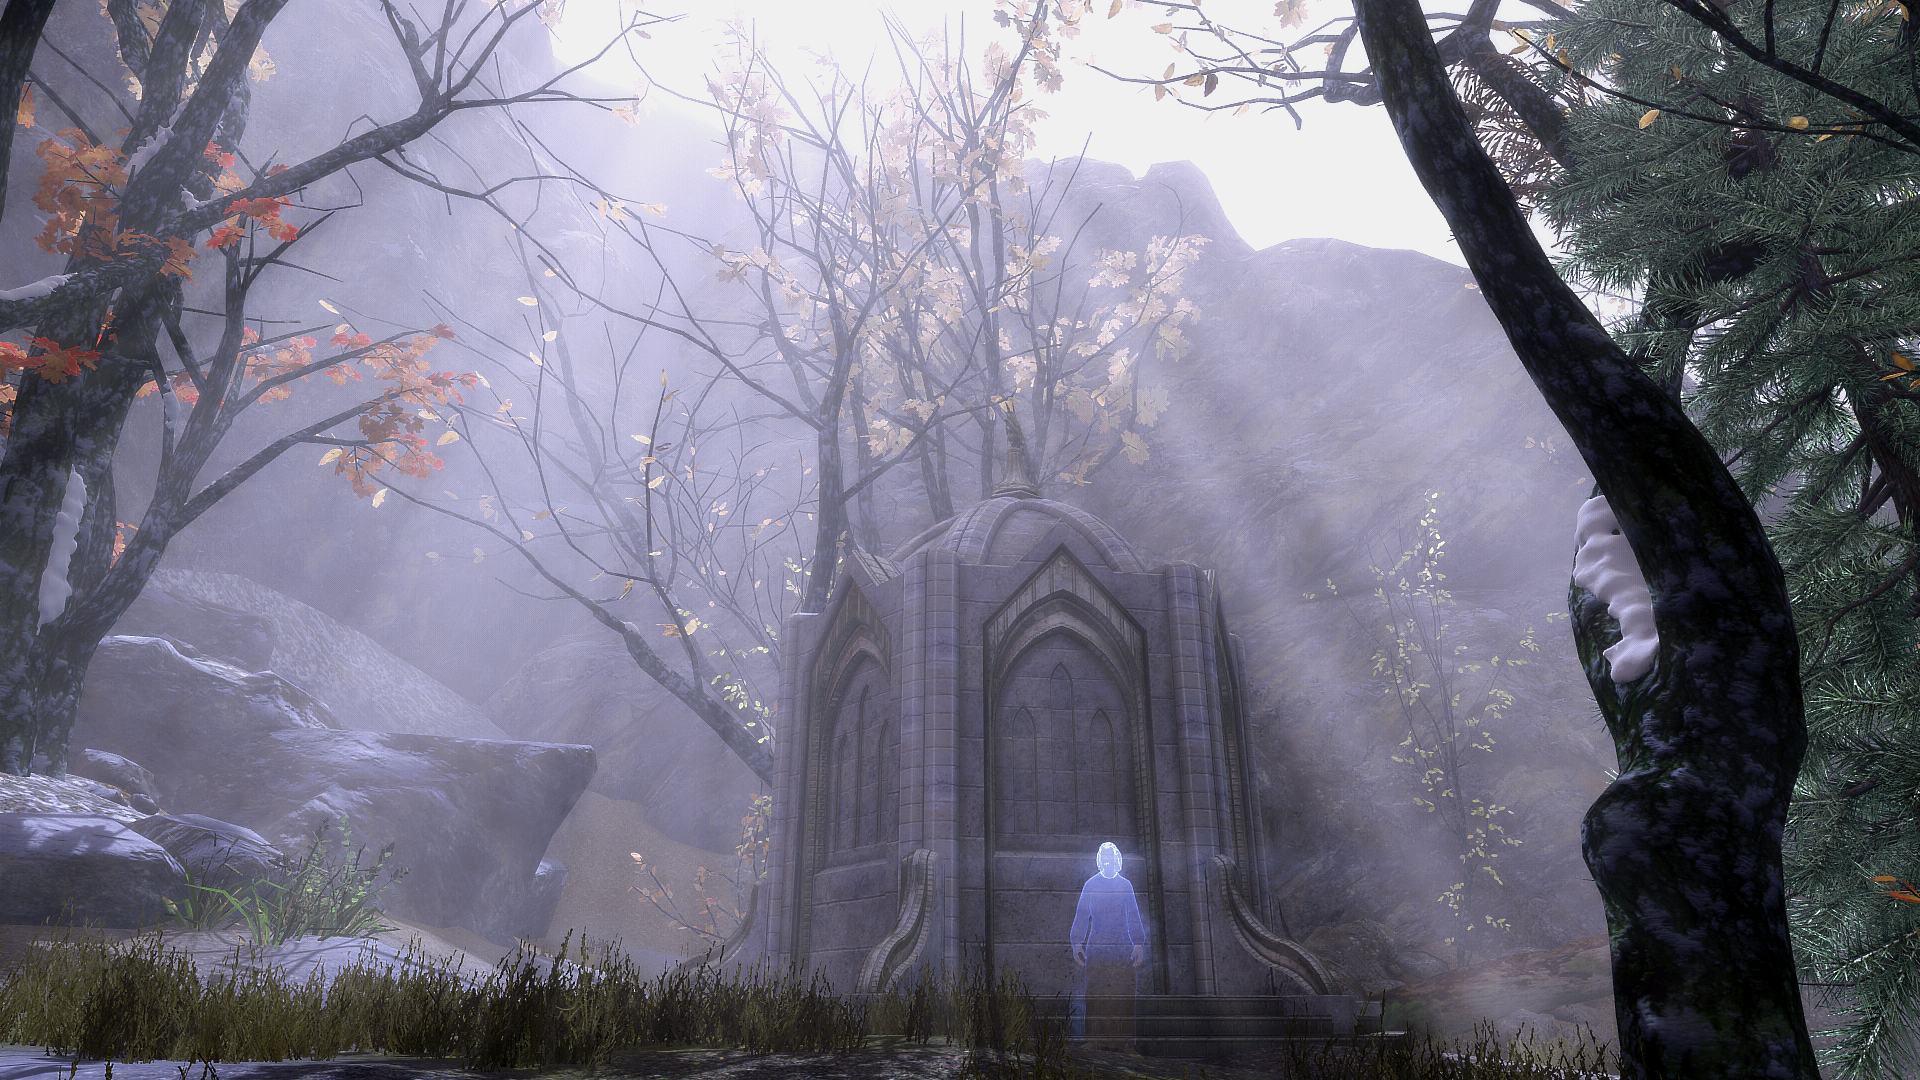 enb2020_1_17_17_45_26.png - The Elder Scrolls 5: Skyrim